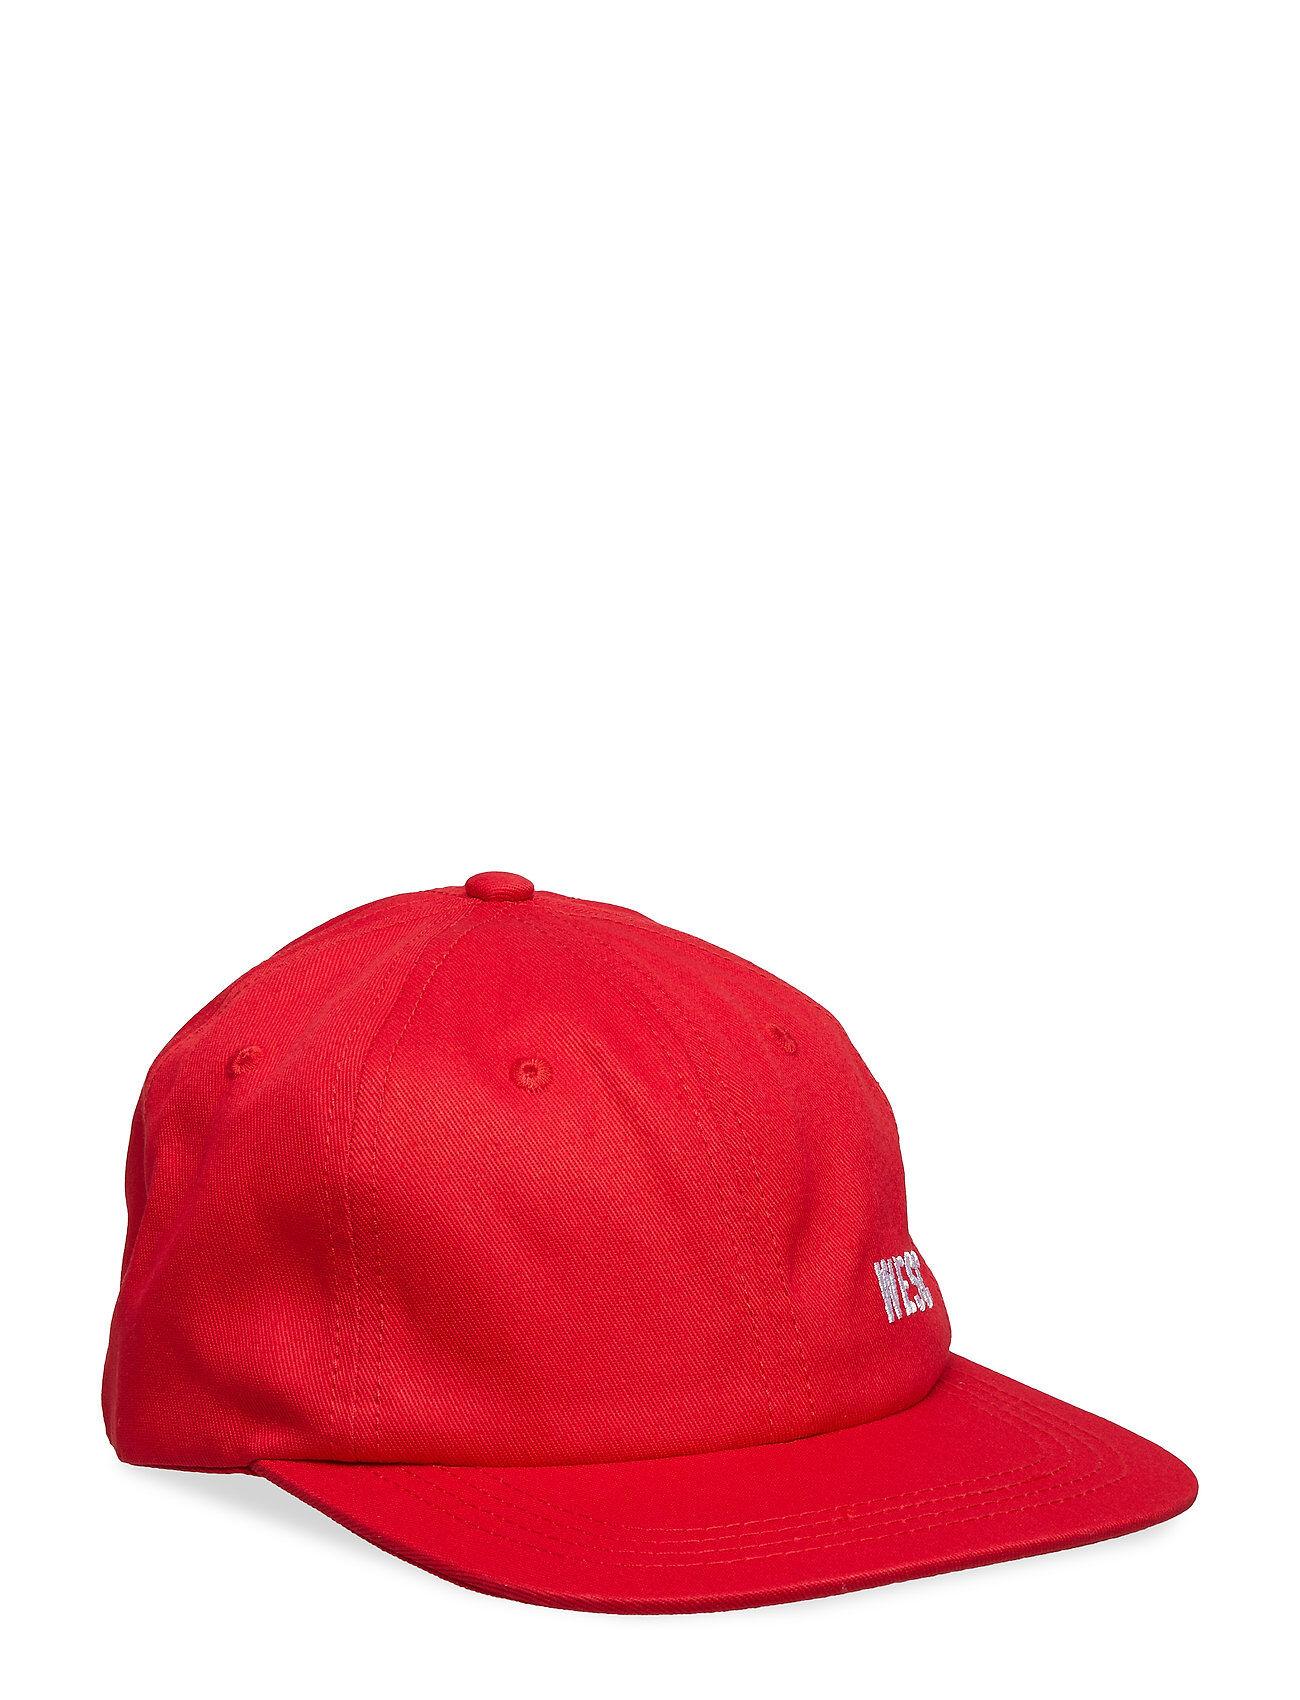 WeSC Hans Tilted Logo Accessories Headwear Caps Punainen WeSC